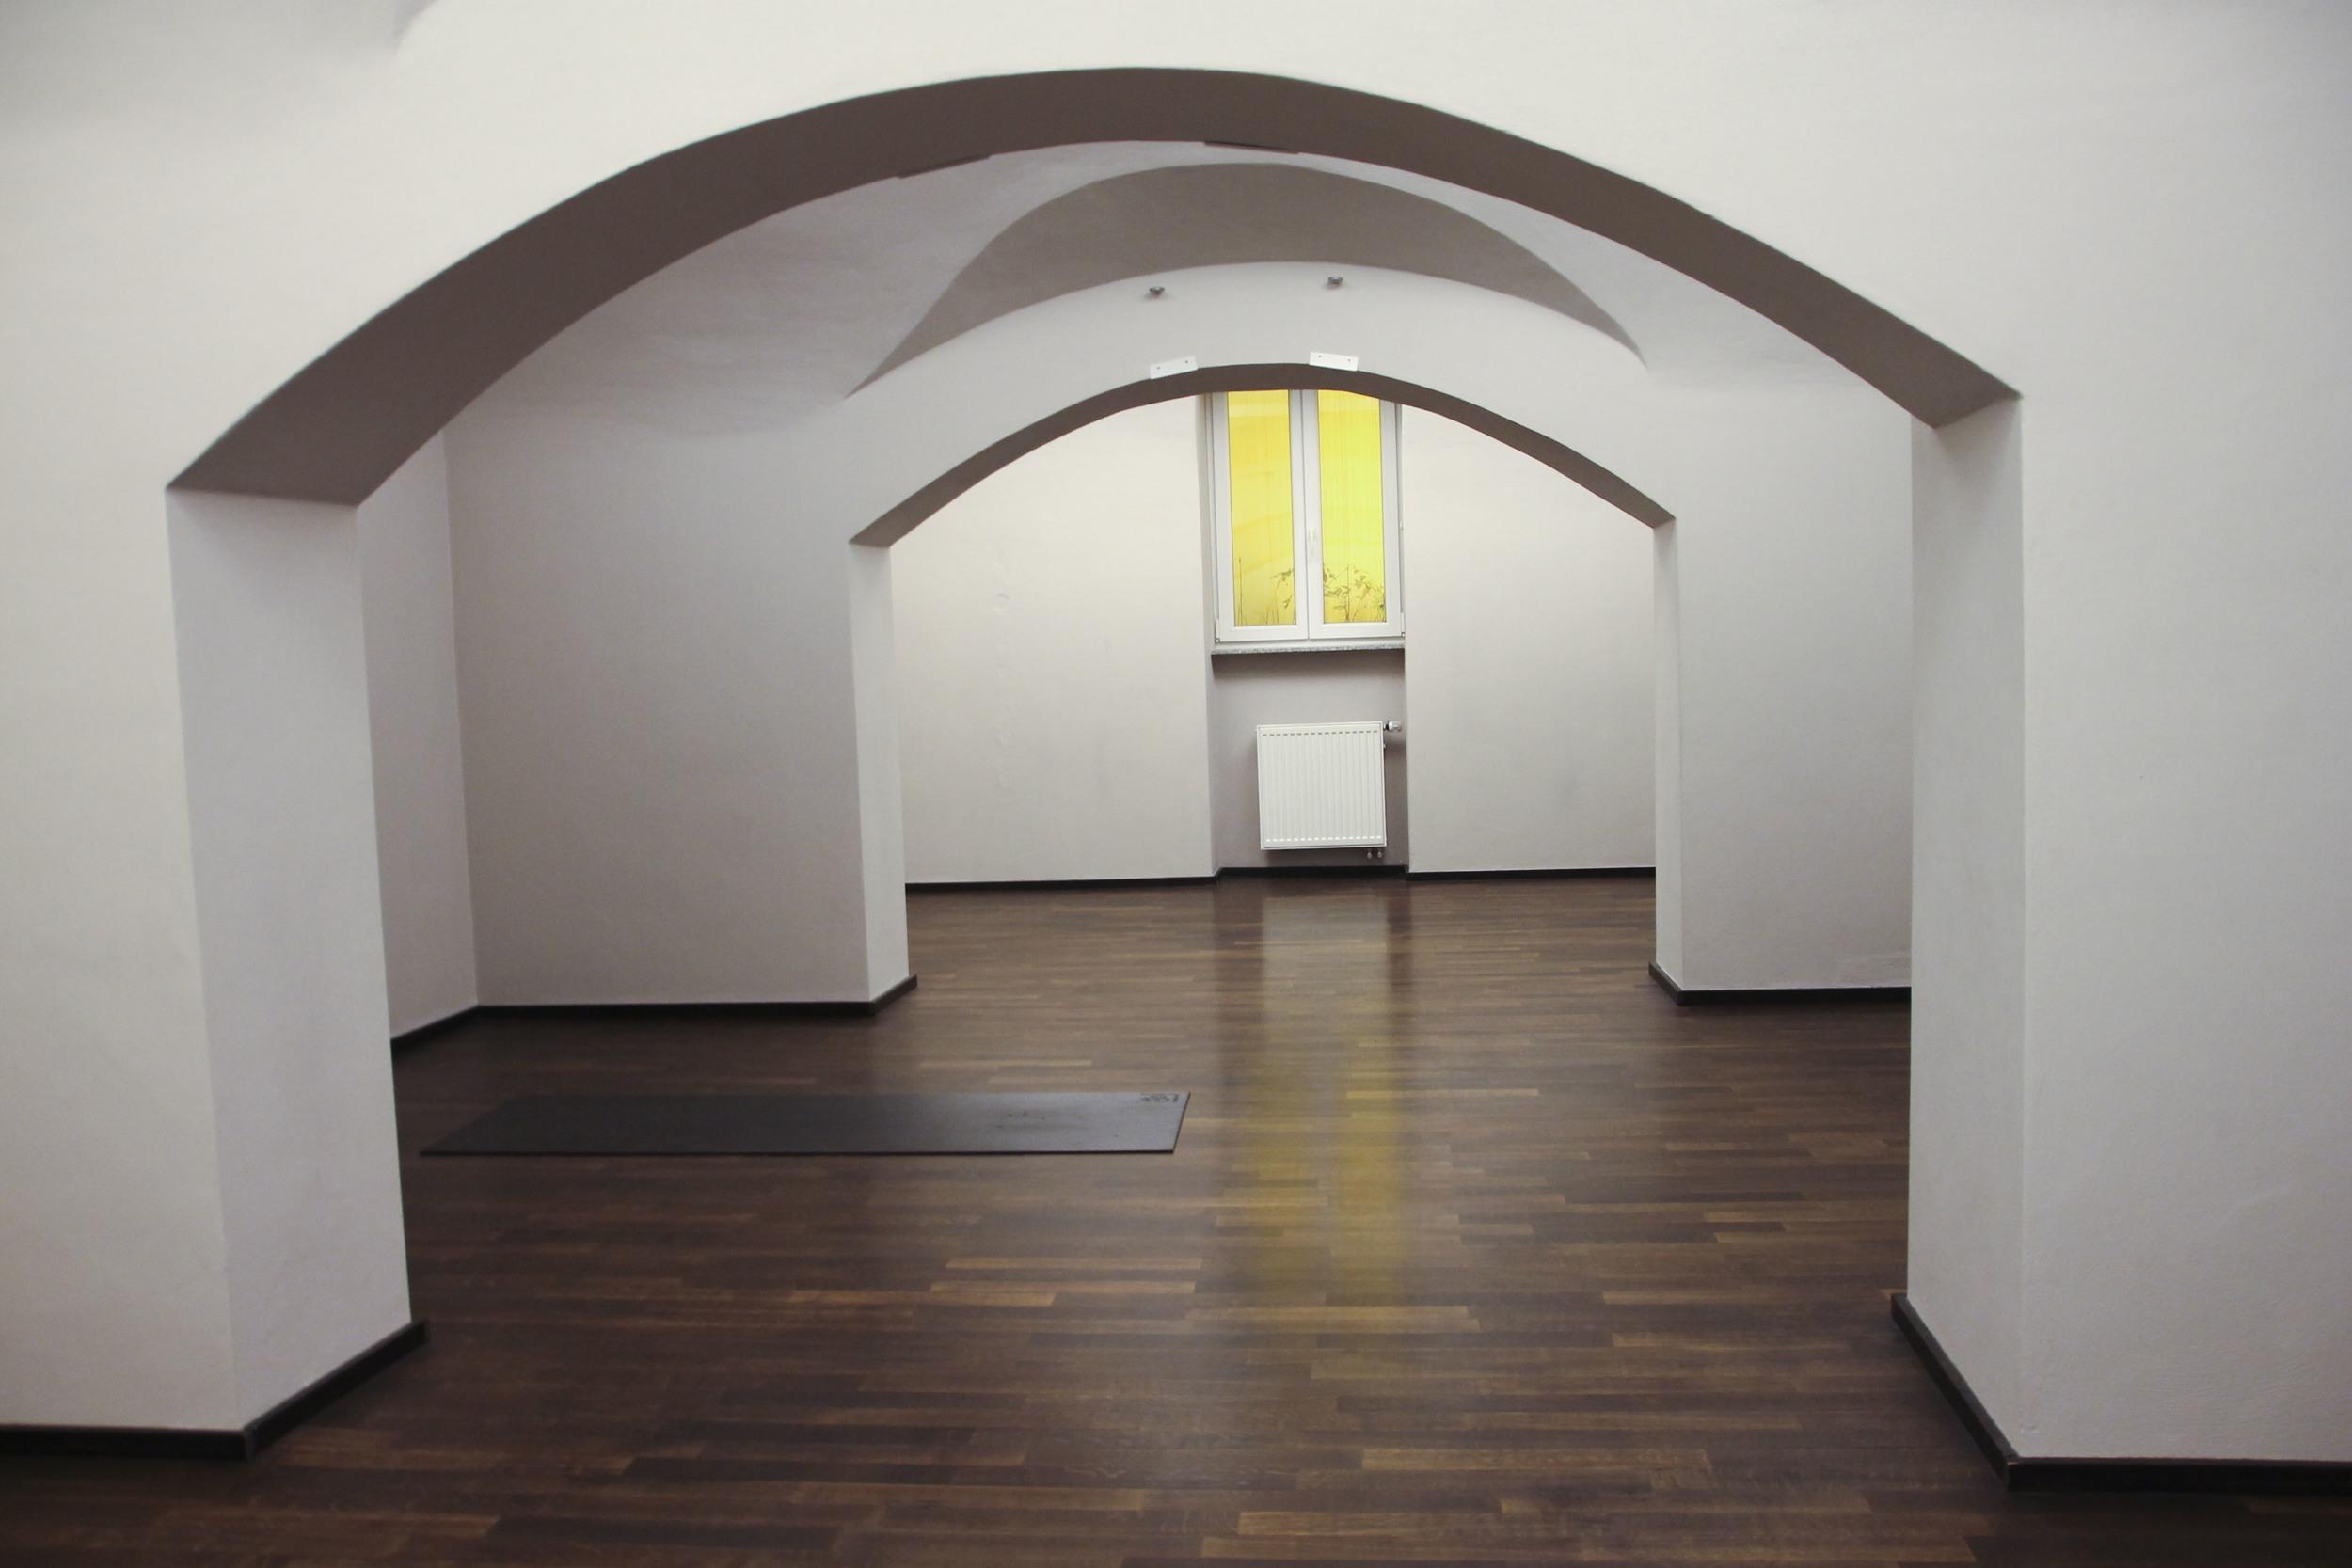 yoga studio werkstatt7 München762.jpg